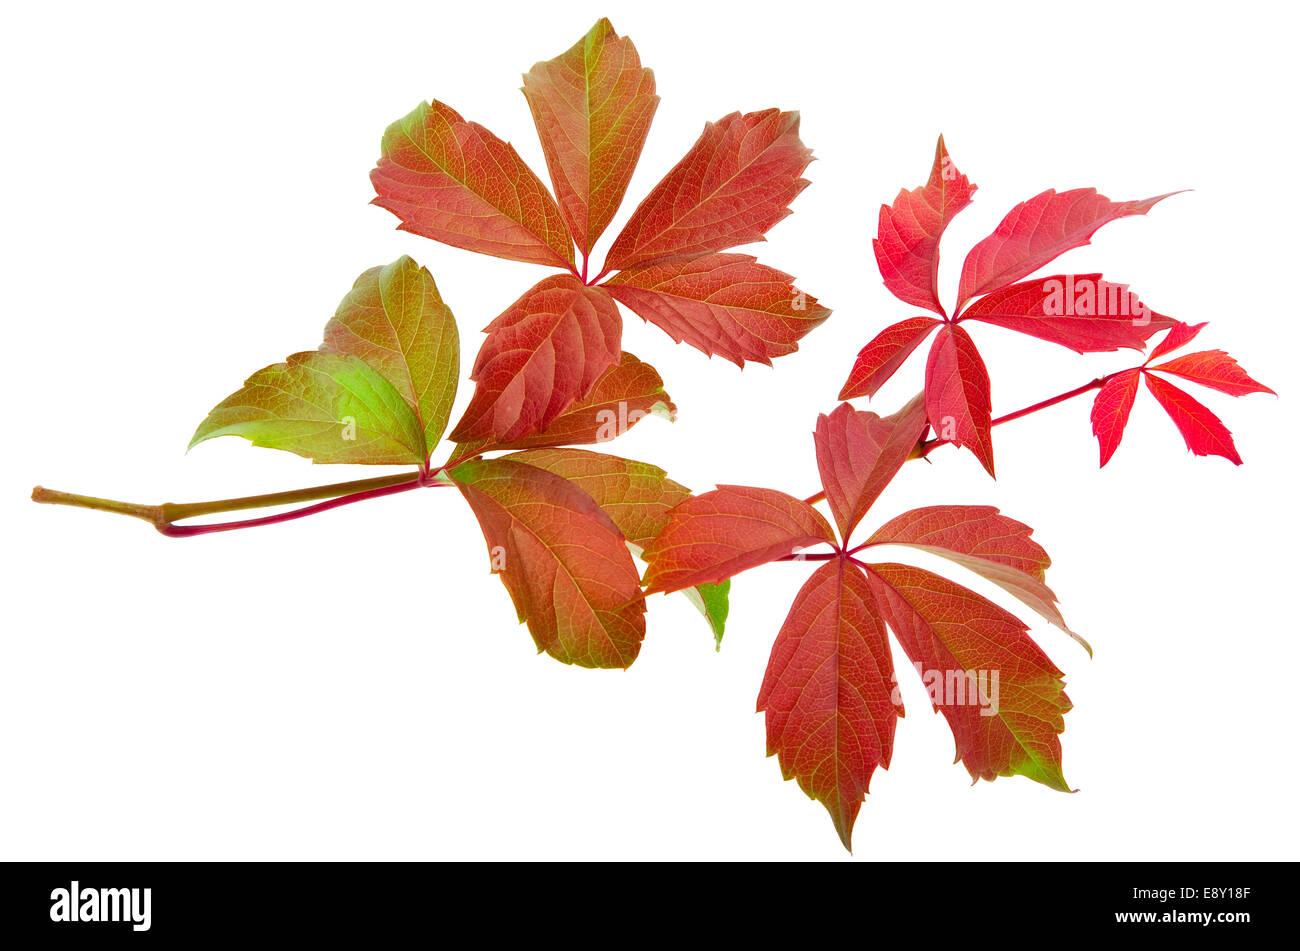 Vine Leaf Icon Stock Photos & Vine Leaf Icon Stock Images - Alamy